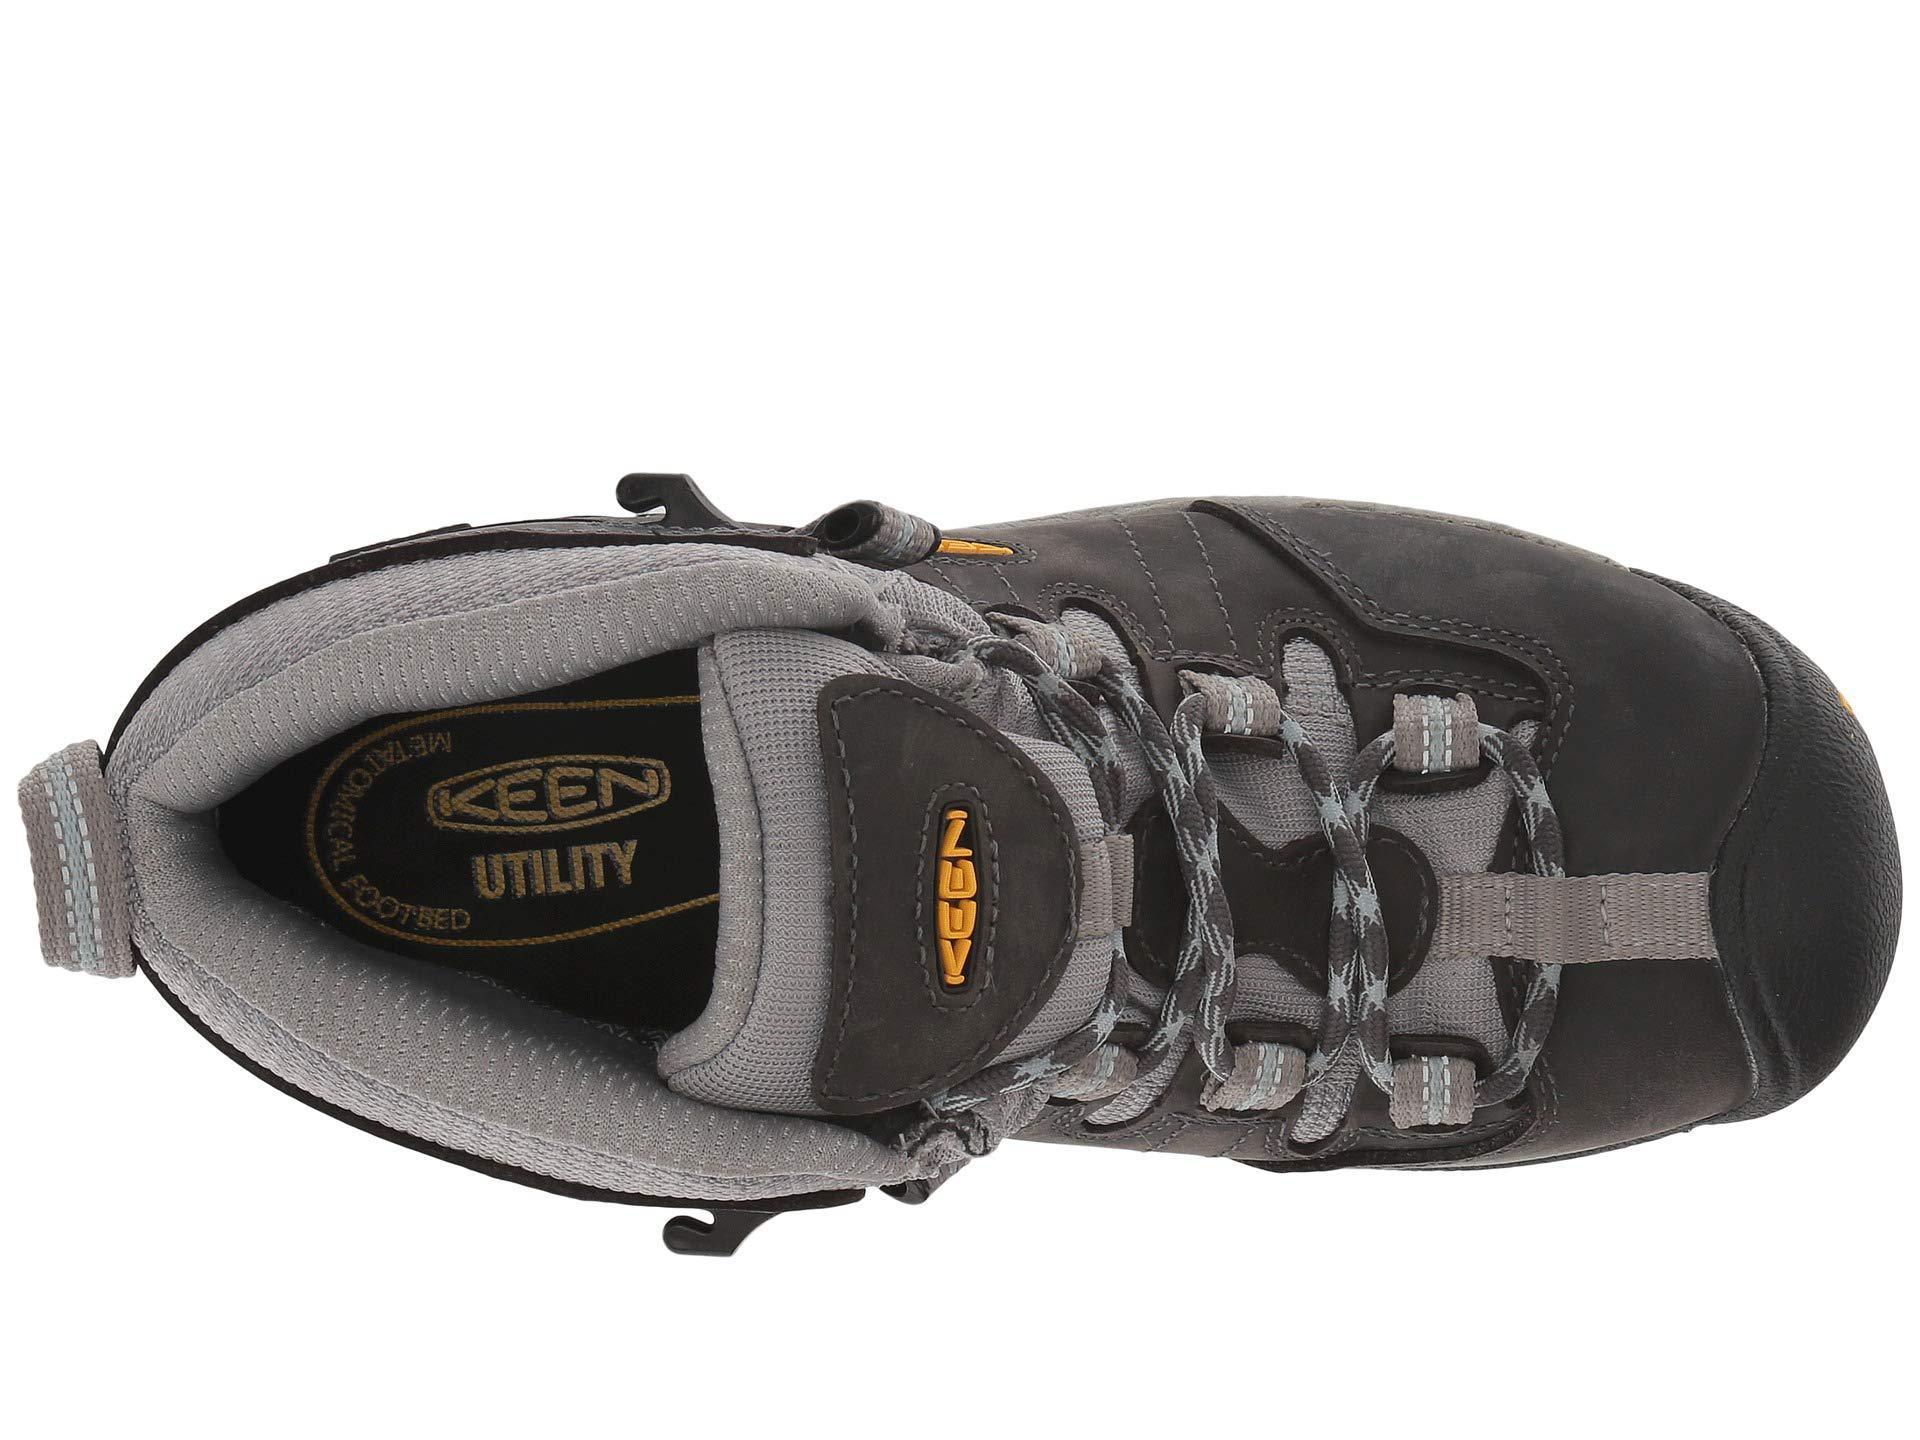 4d0d4d27cbaf Keen Utility - Detroit Xt Mid Soft Toe Waterproof (magnet sterling Blue)  Women s. View fullscreen